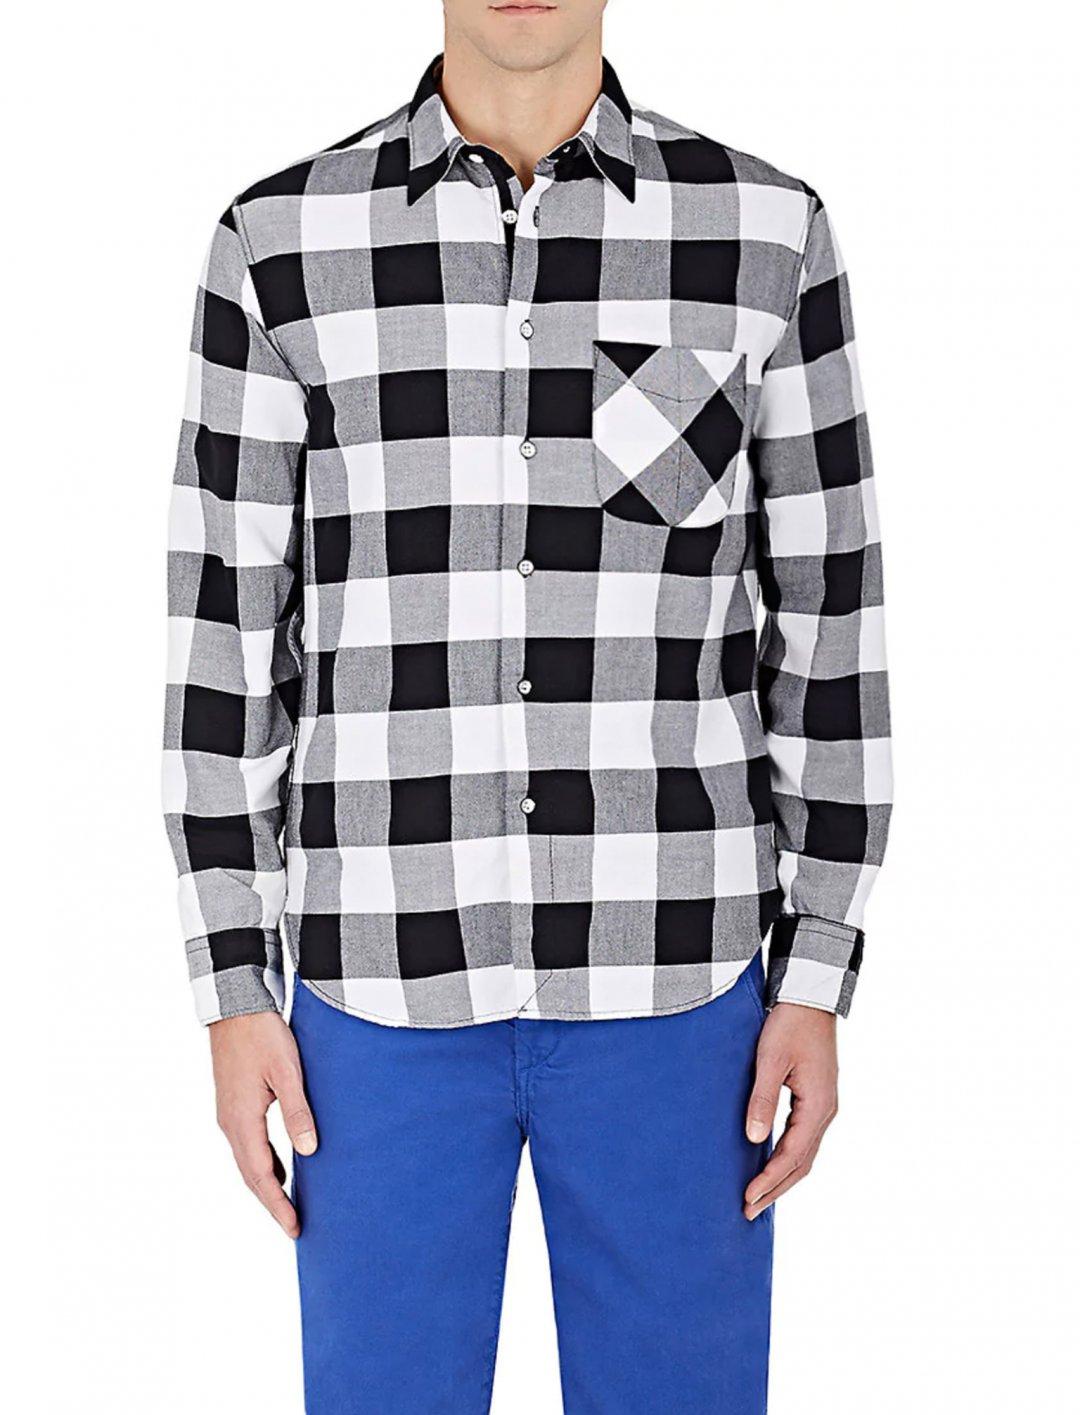 Timberlake's Buffalo-Checked Cotton Shirt Clothing Rag & Bone